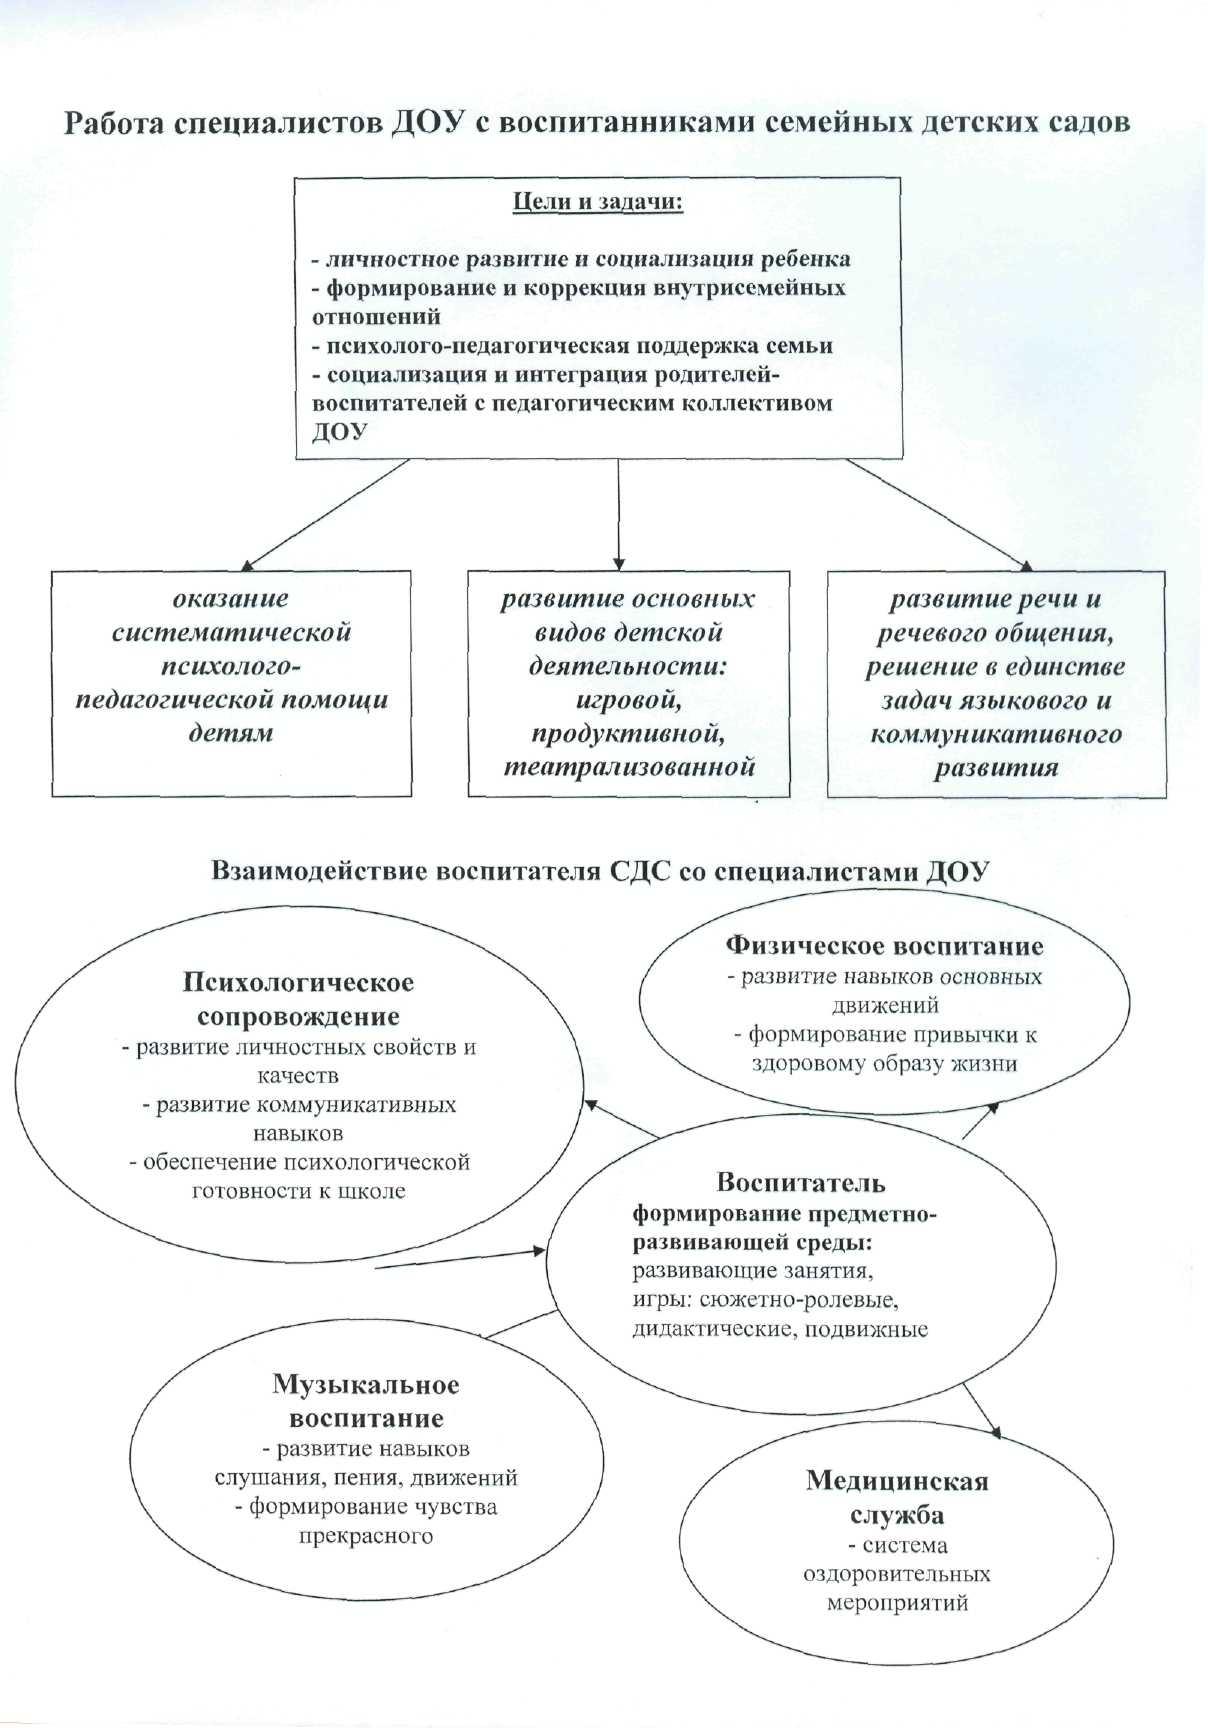 Схема контроля фгос доу